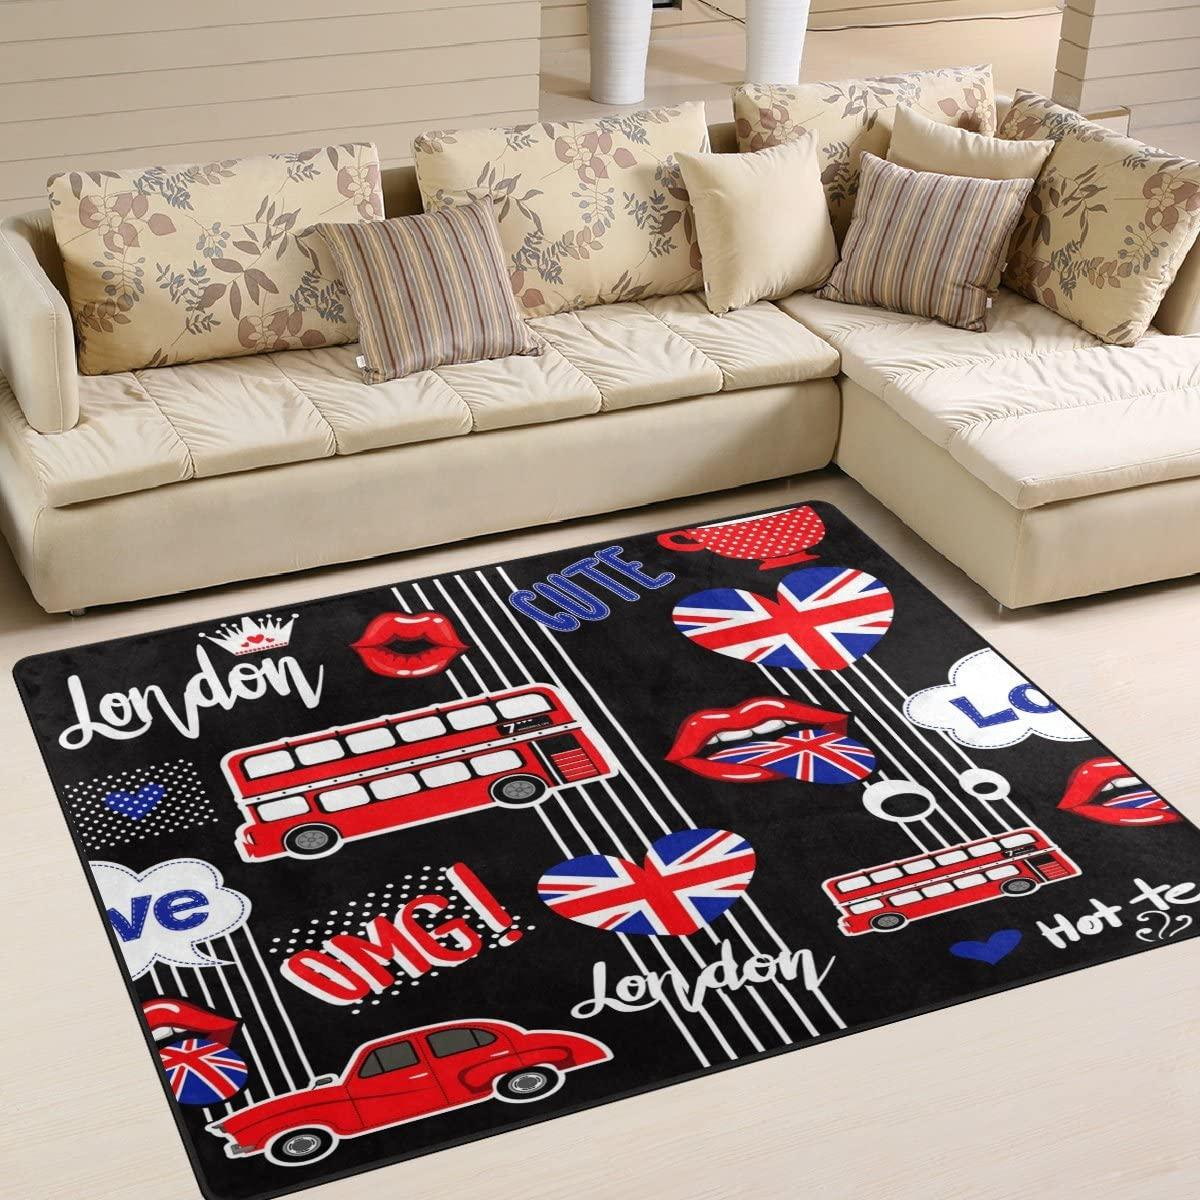 ALAZA London Stylish Union Jack Lips Bus Area Rug Rugs for Living Room Bedroom 7' x 5'